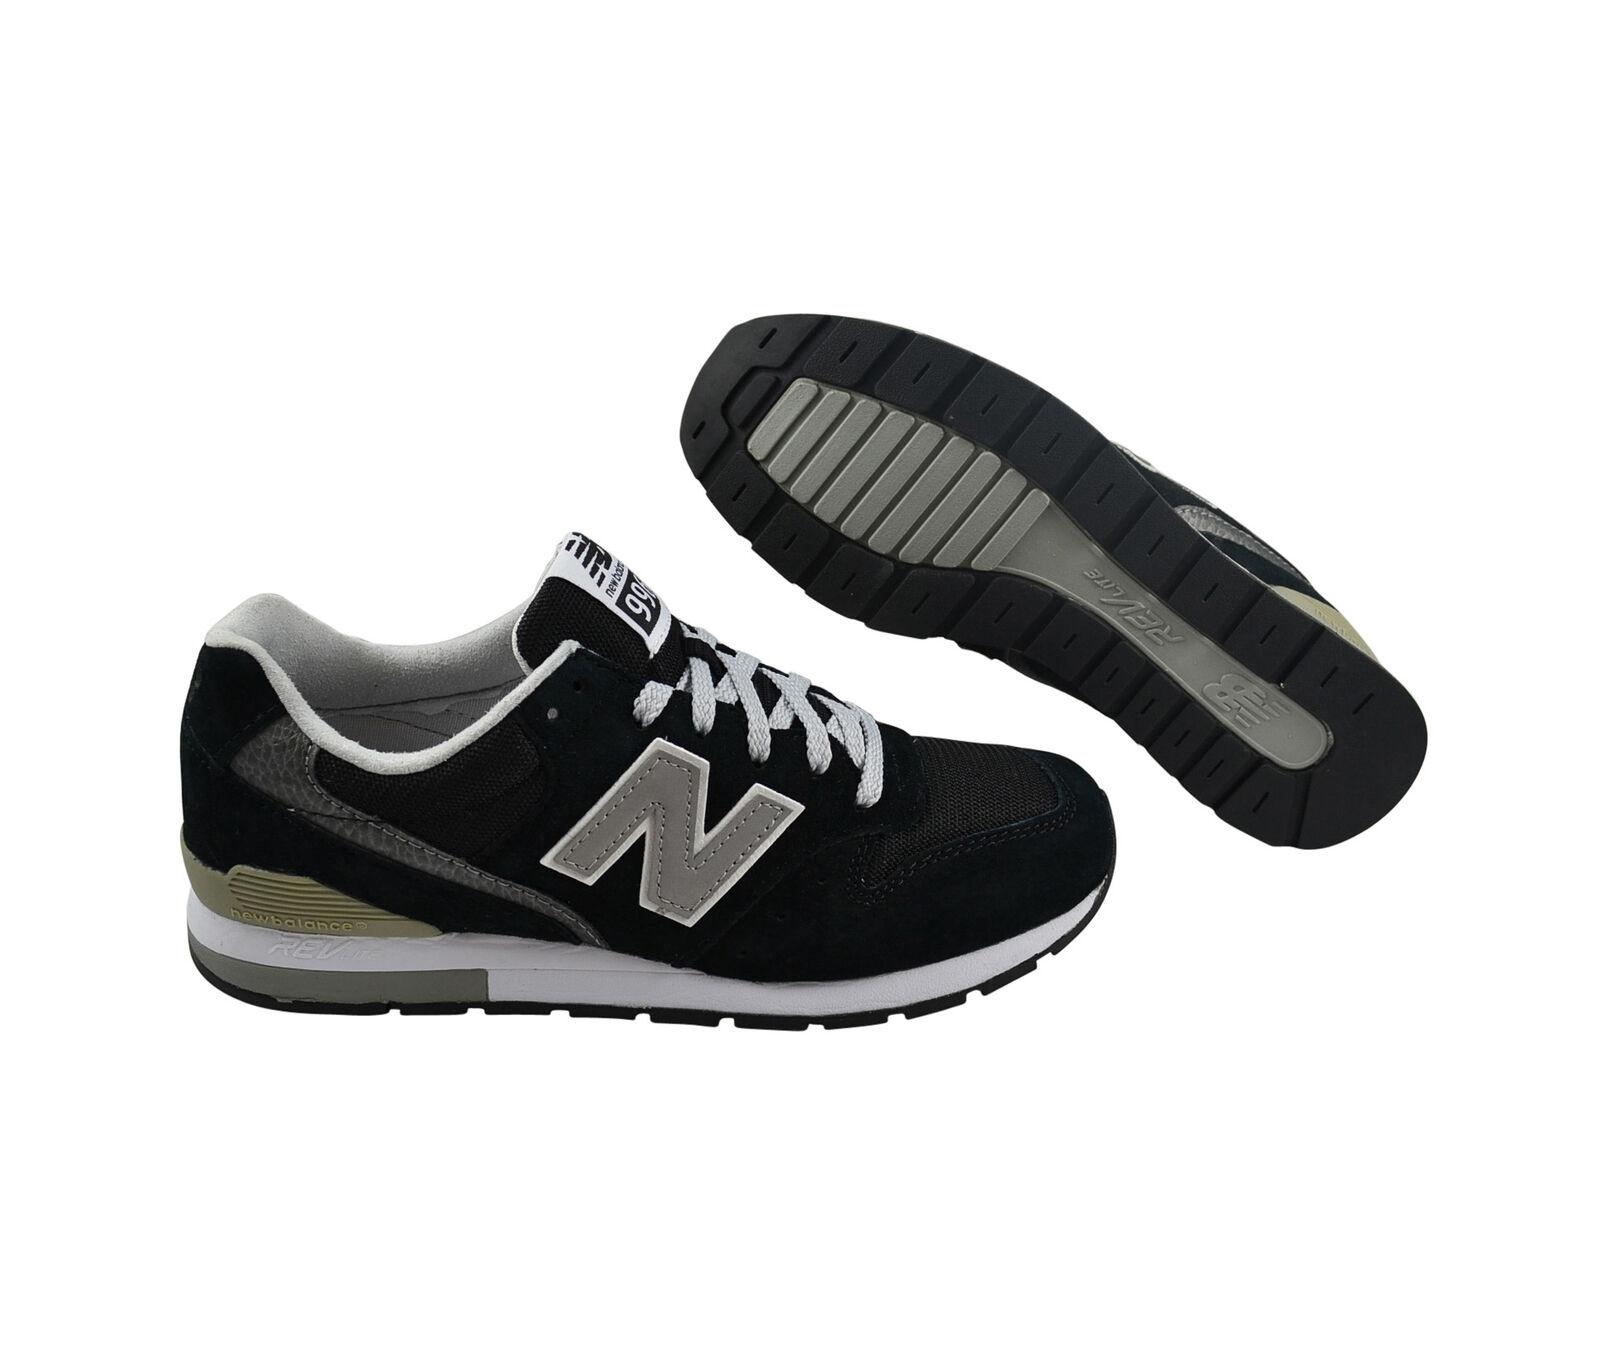 New Balance MRL996 BL black Schuhe/Sneaker schwarz Größenauswahl!